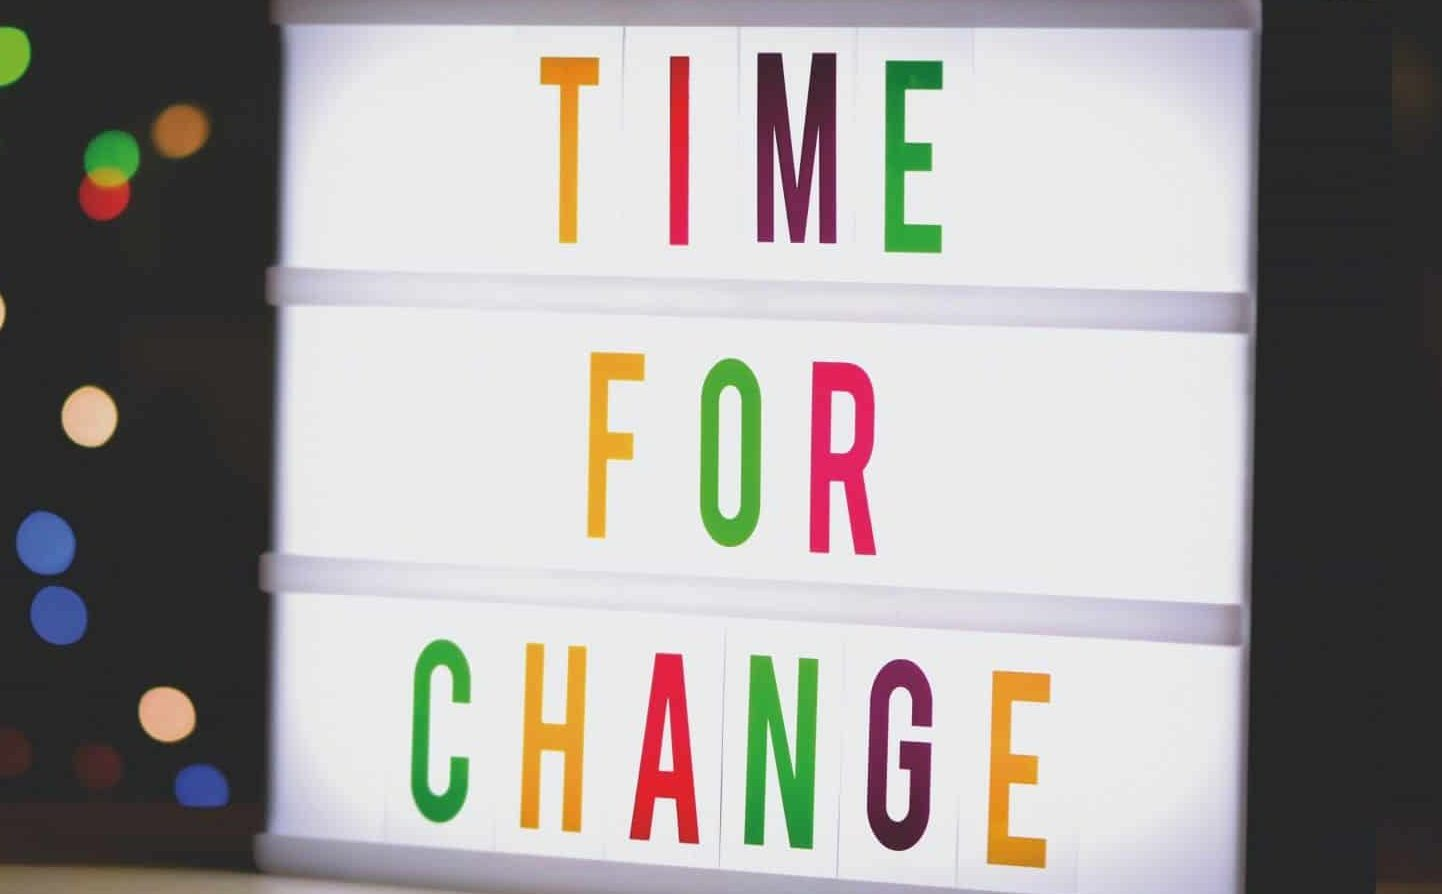 change habit